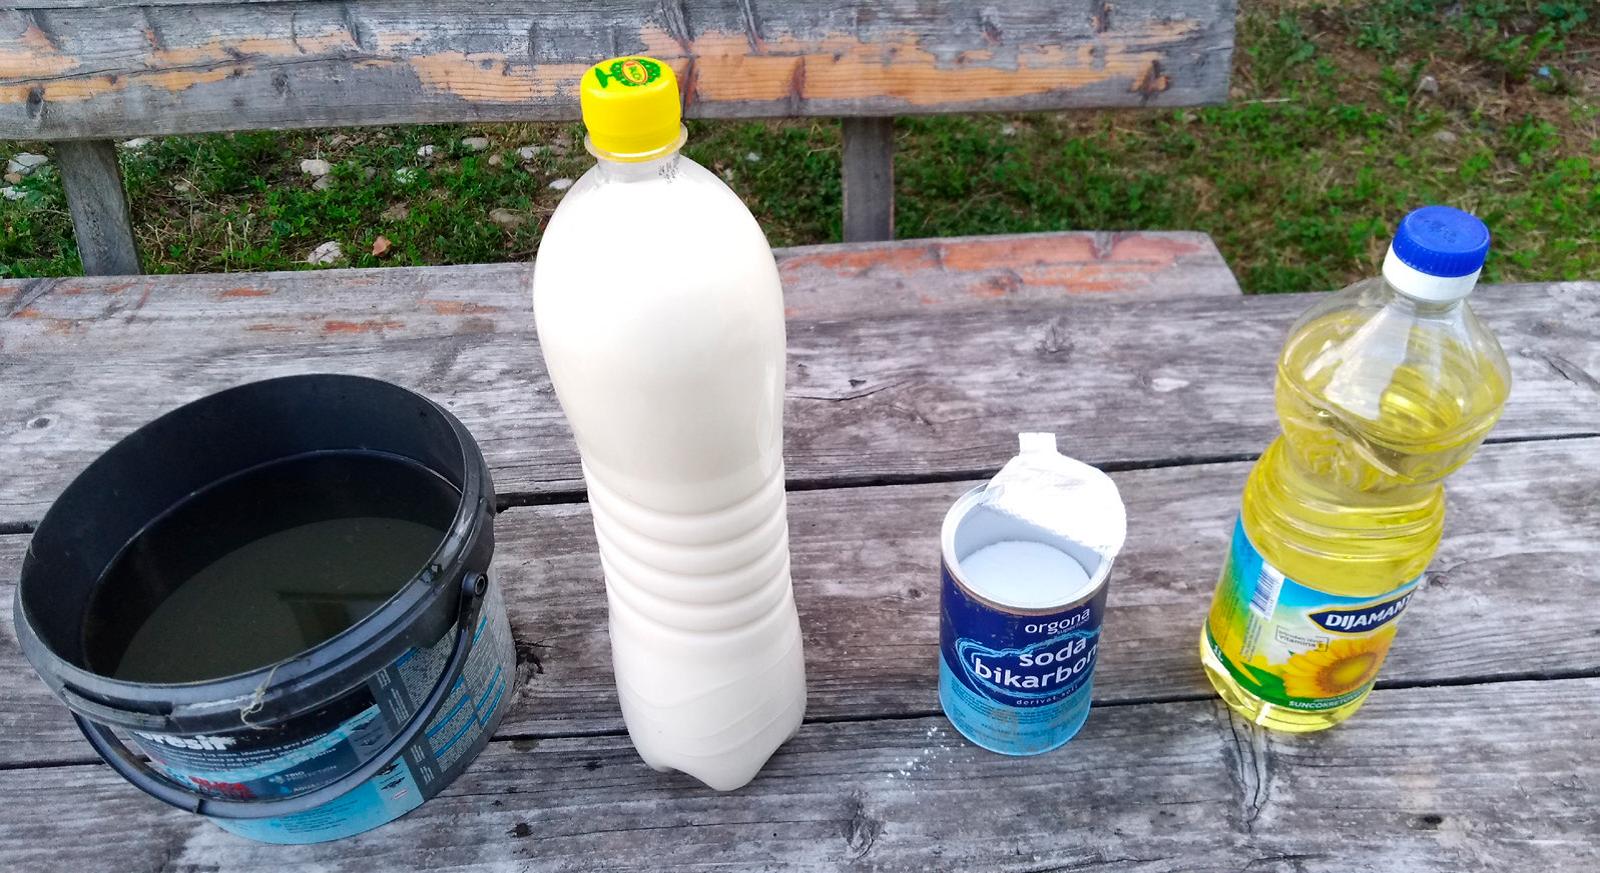 Ilustracija: mleko i ulje, foto: Bojan Kecman